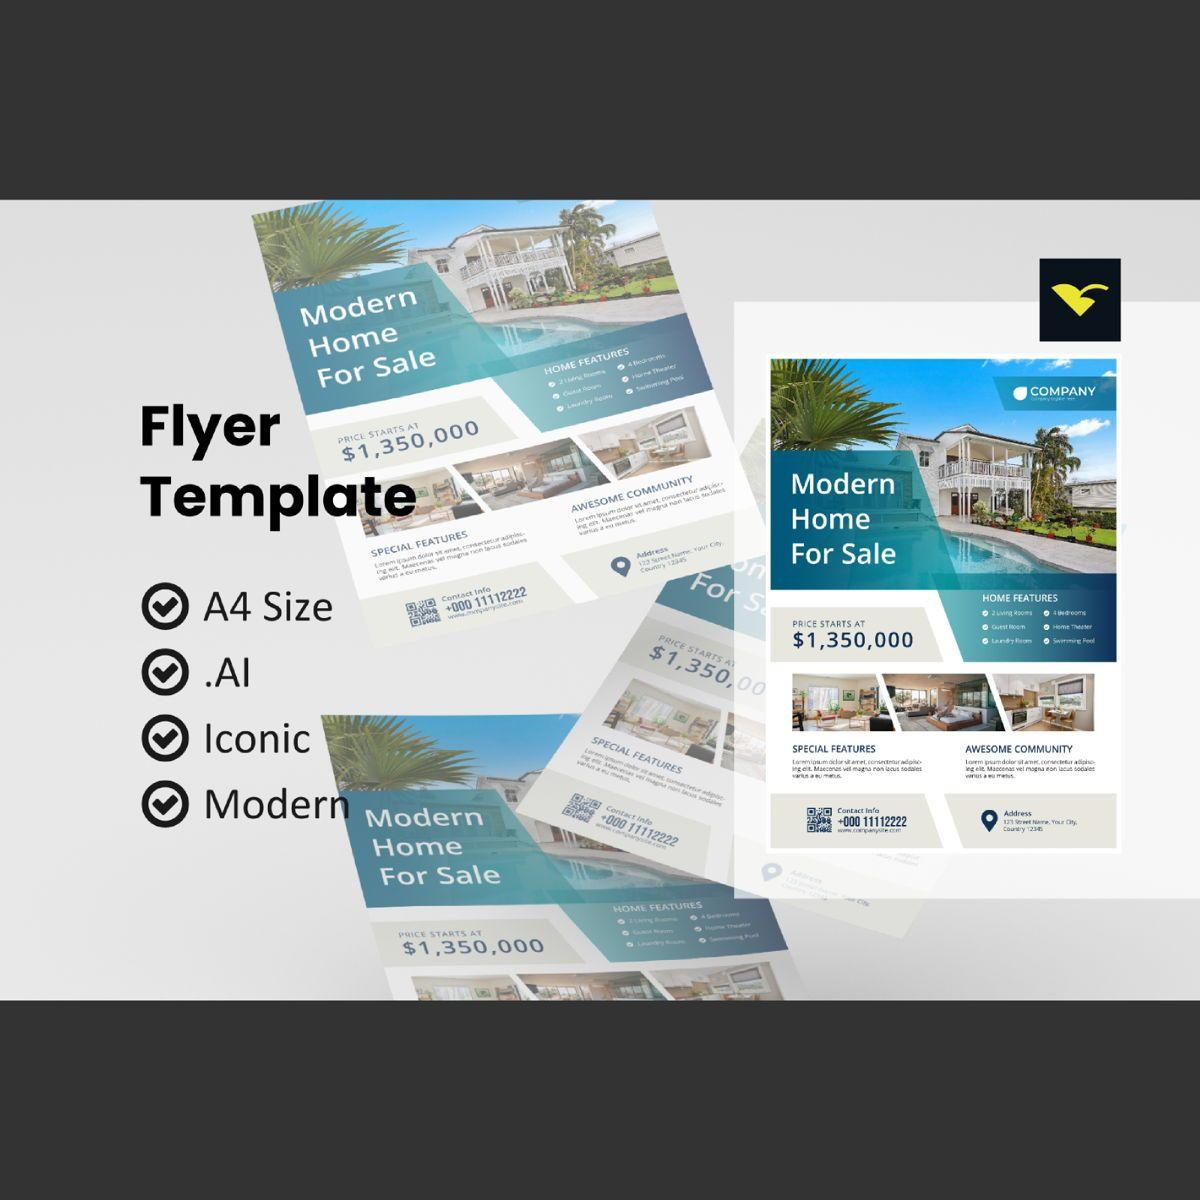 Business property flyer template, 08977, Construction — PoweredTemplate.com